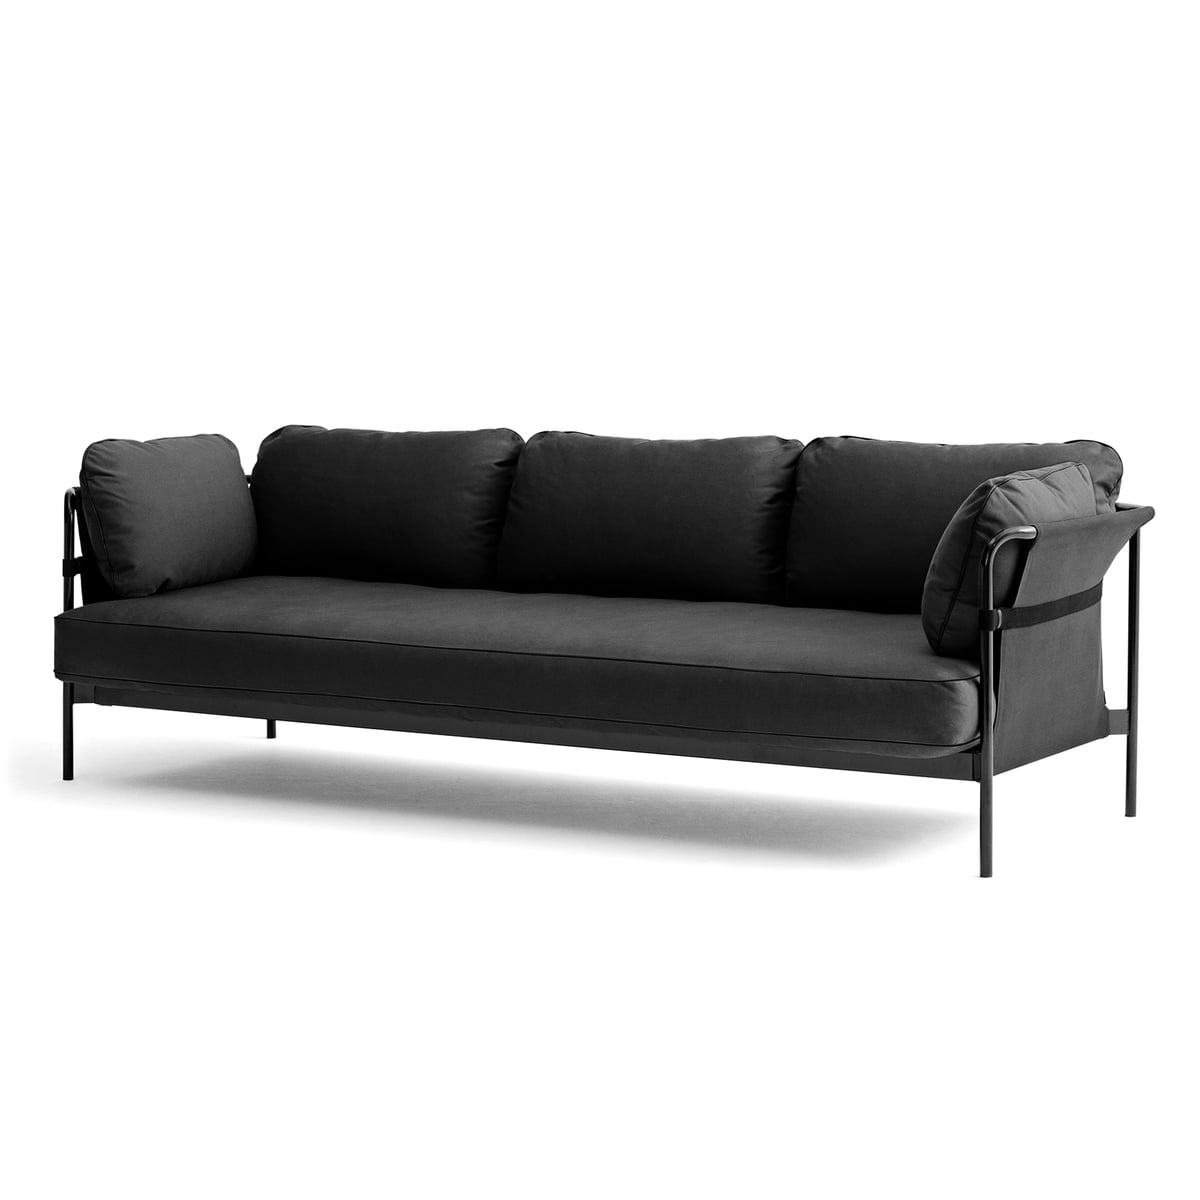 Full Size of Can Sofa 3 Sitzer Von Hay Connox Xxxl 2 Mit Schlaffunktion Xxl Grau U Form Grün Vitra Franz Fertig Günstige Büffelleder Big Kolonialstil Sofa Sofa 3 Sitzer Grau